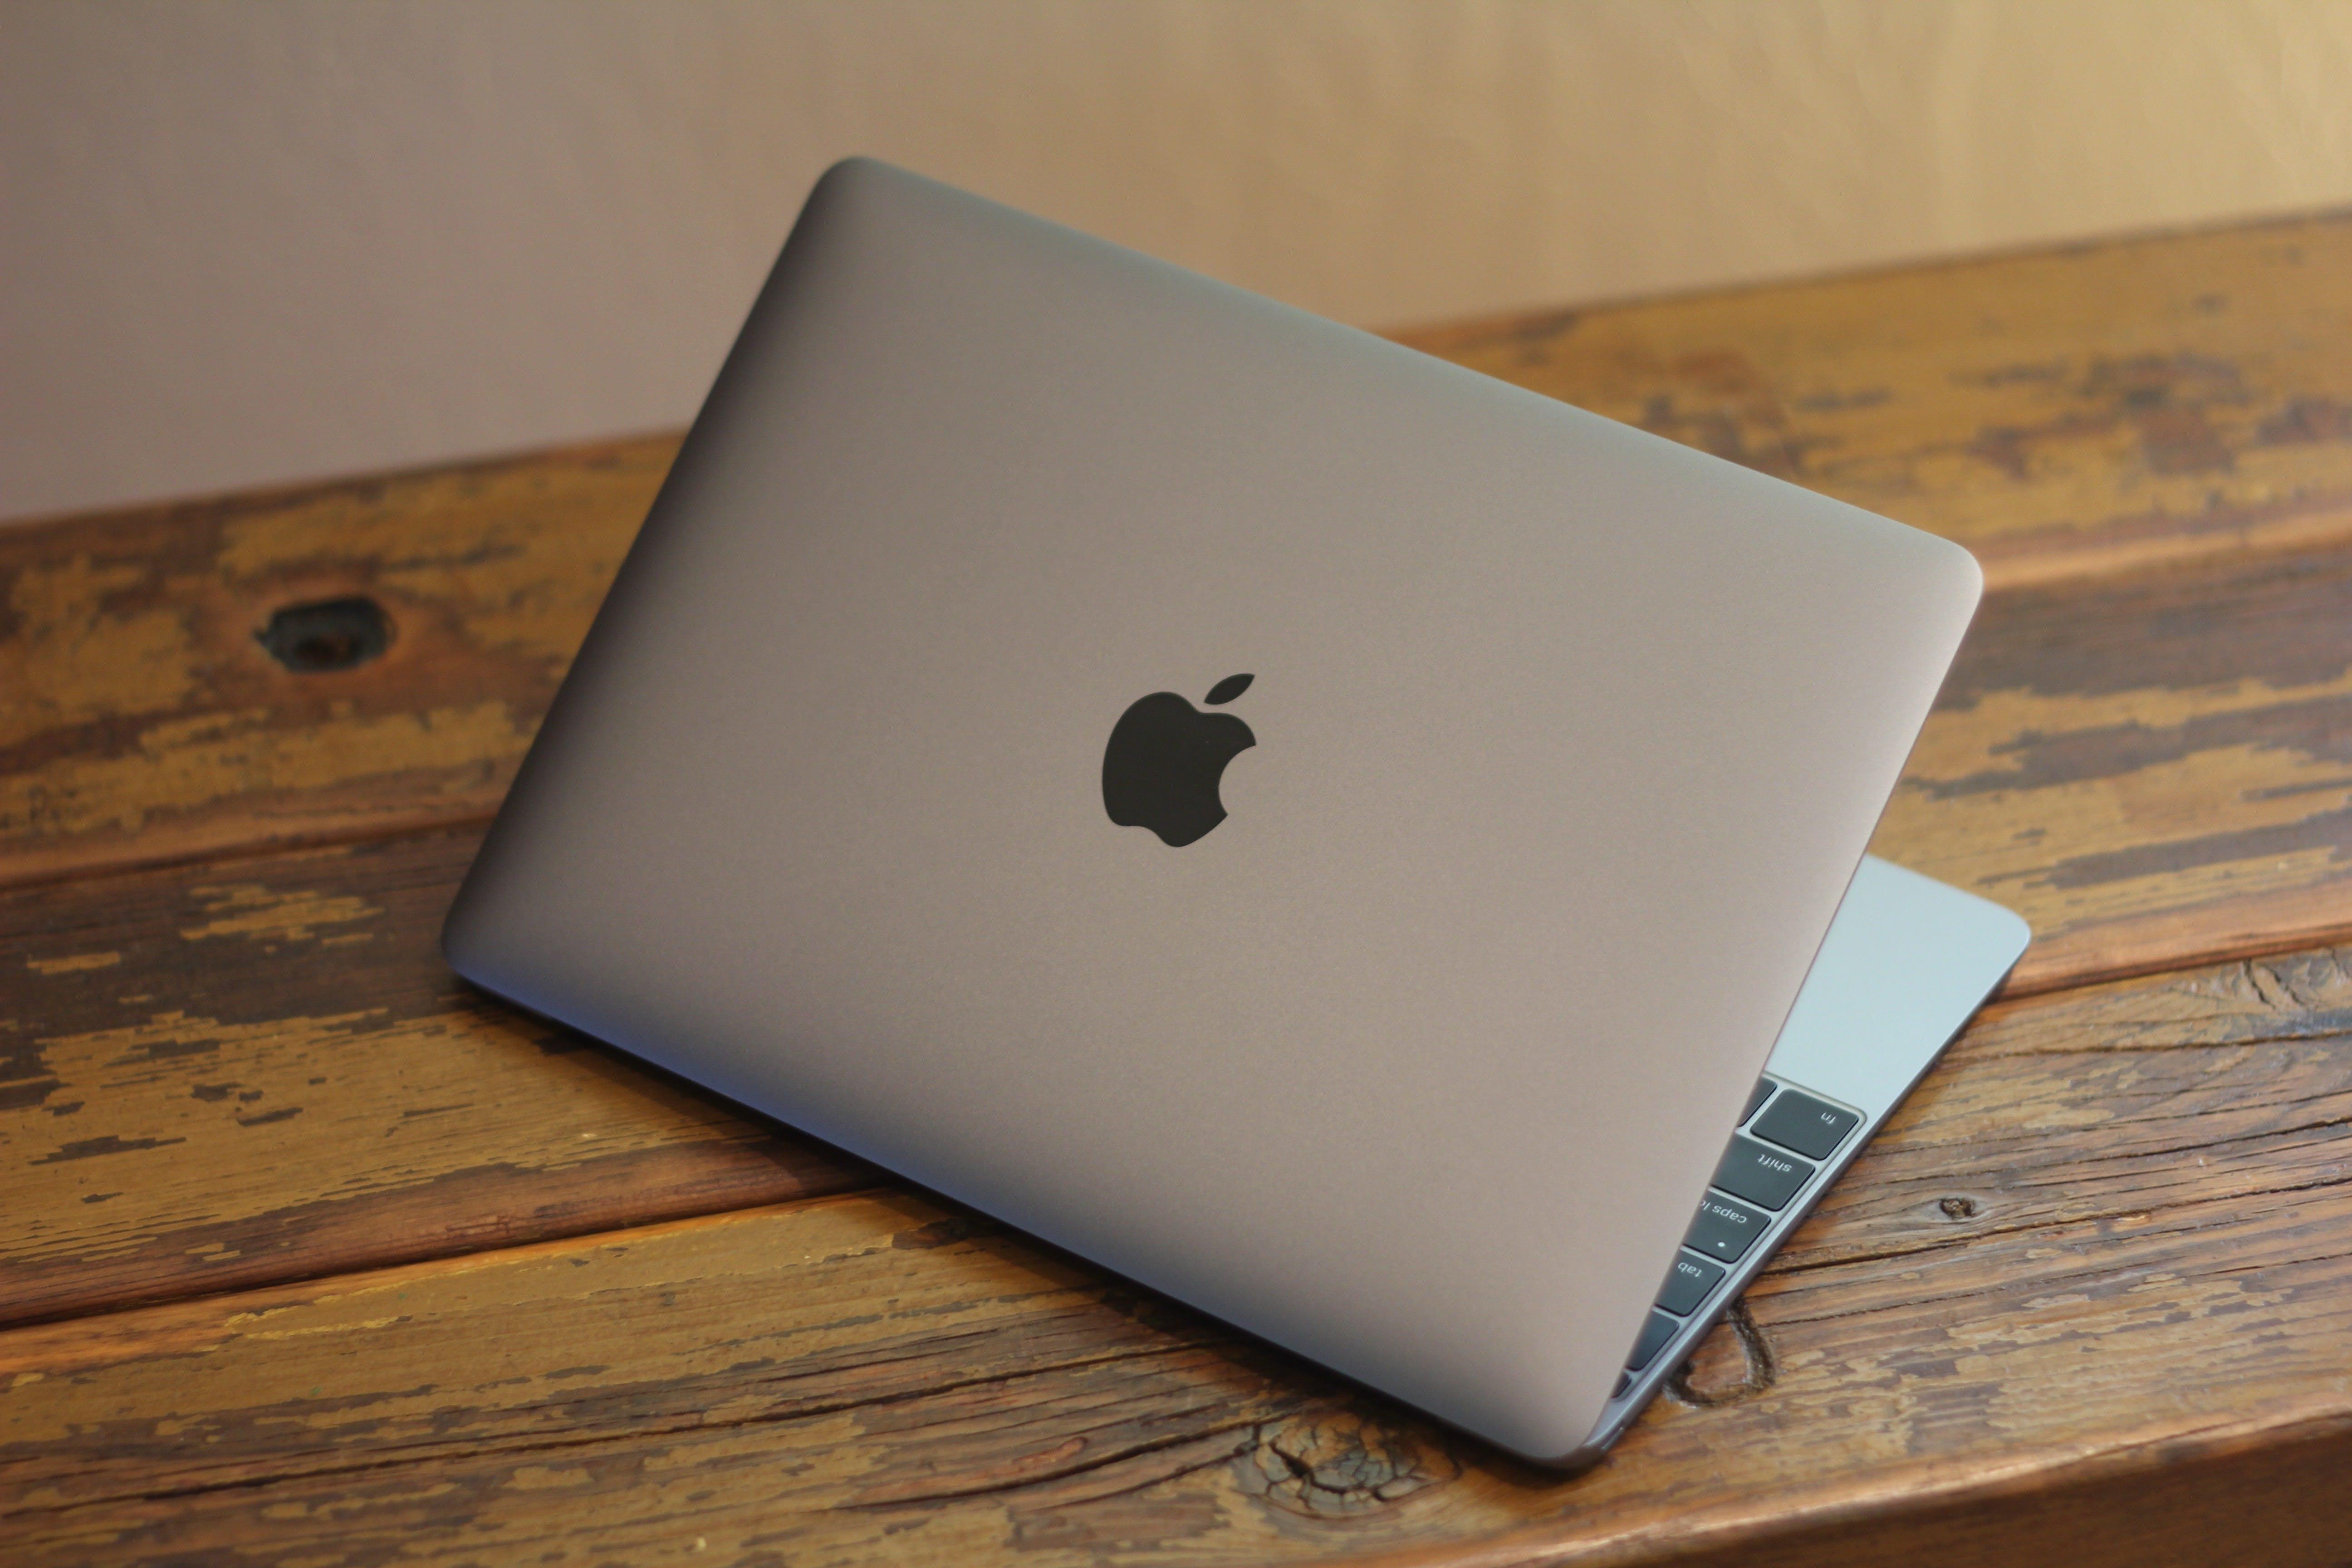 comment reinitialiser son macbook